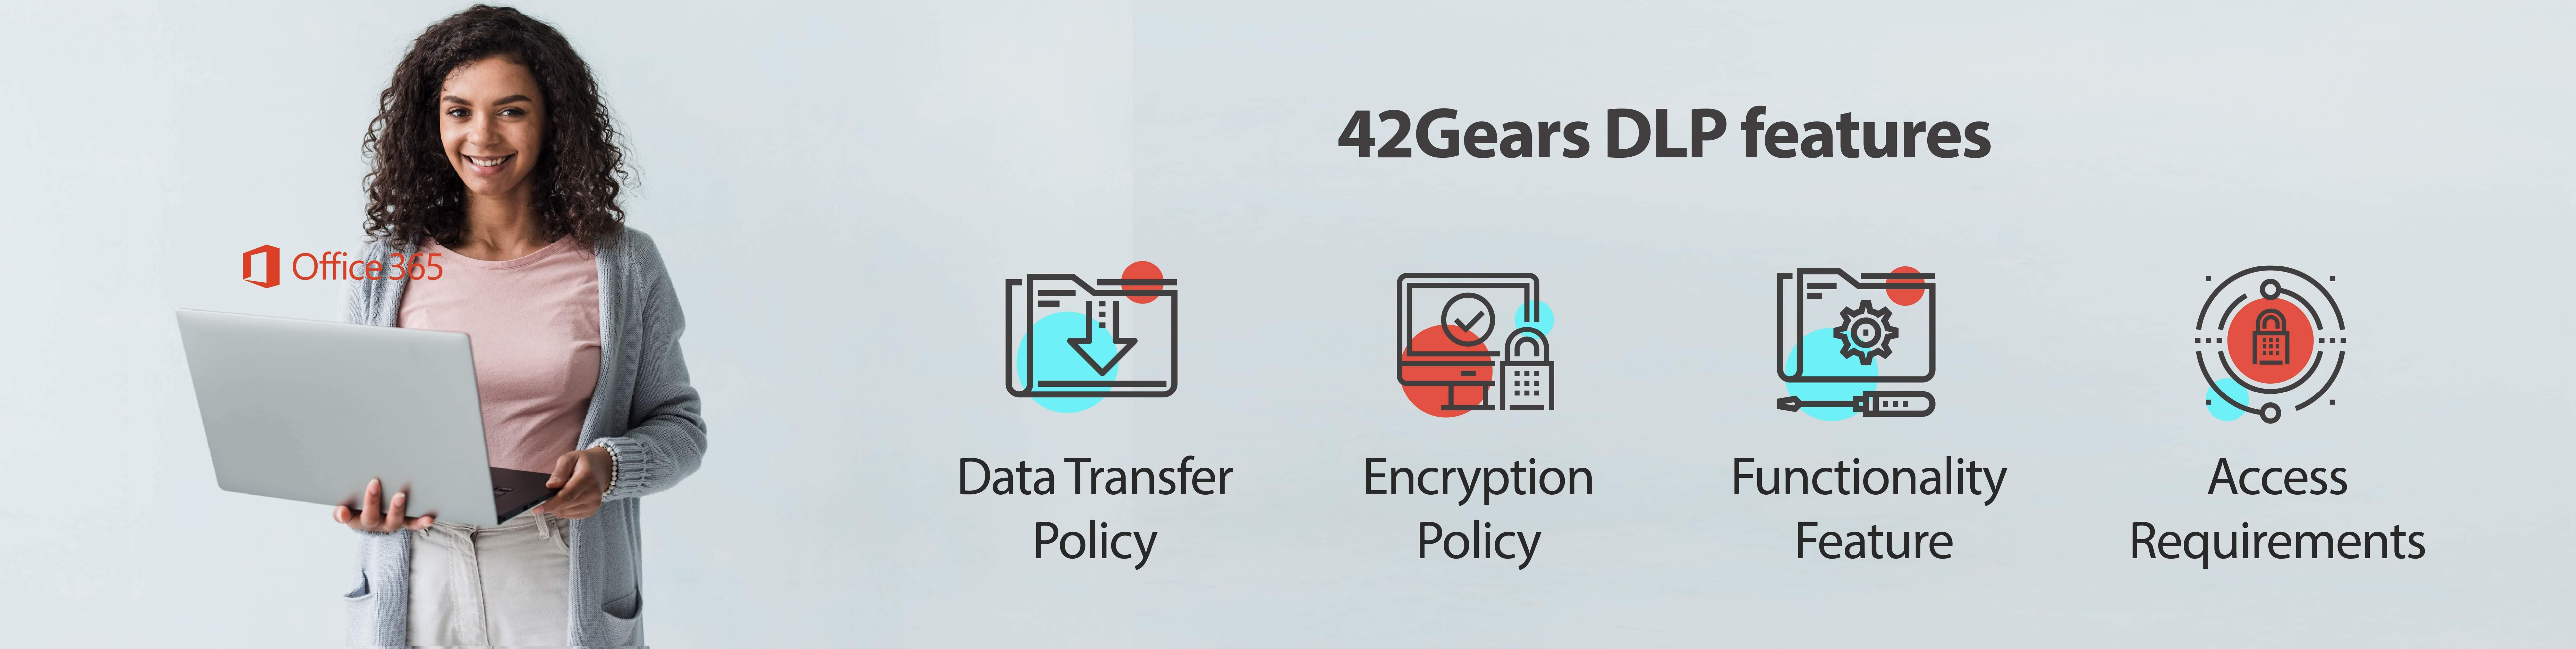 Microsoft Office 365 Data Loss Prevention (DLP) - FeaturesBanner